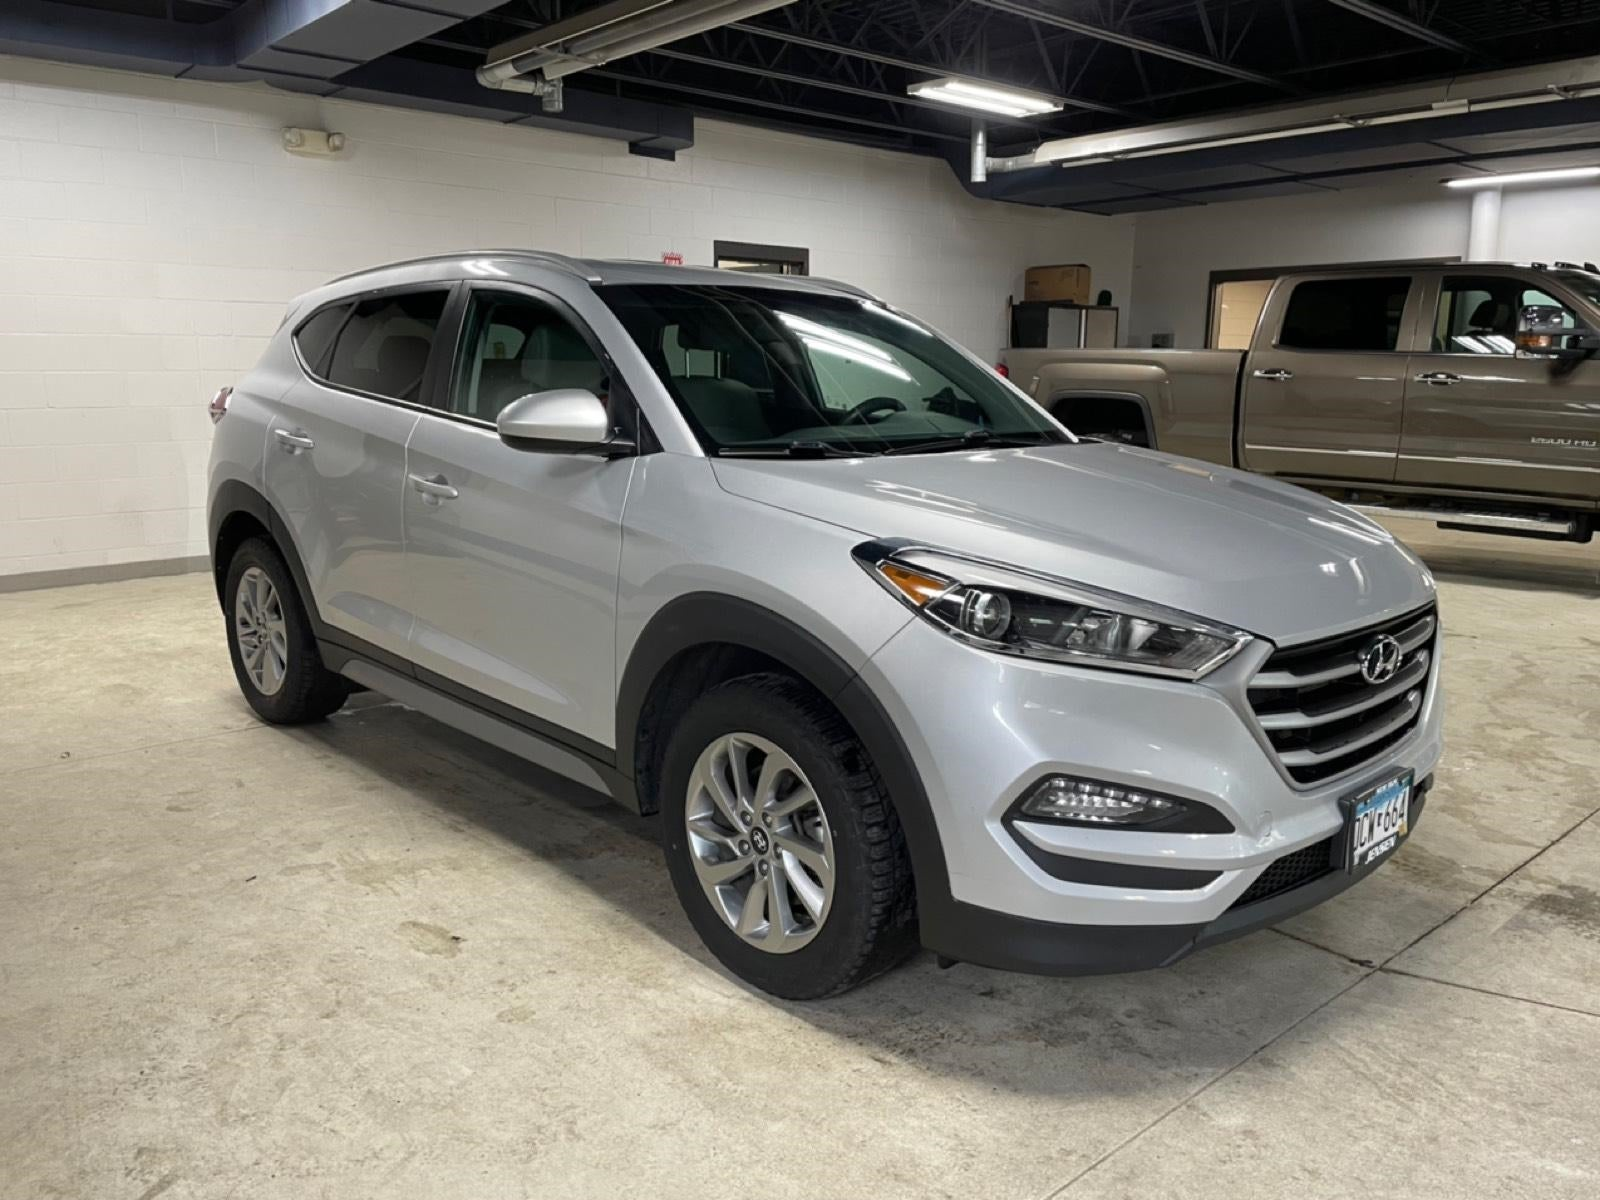 Used 2018 Hyundai Tucson SEL with VIN KM8J3CA41JU767179 for sale in New Ulm, Minnesota